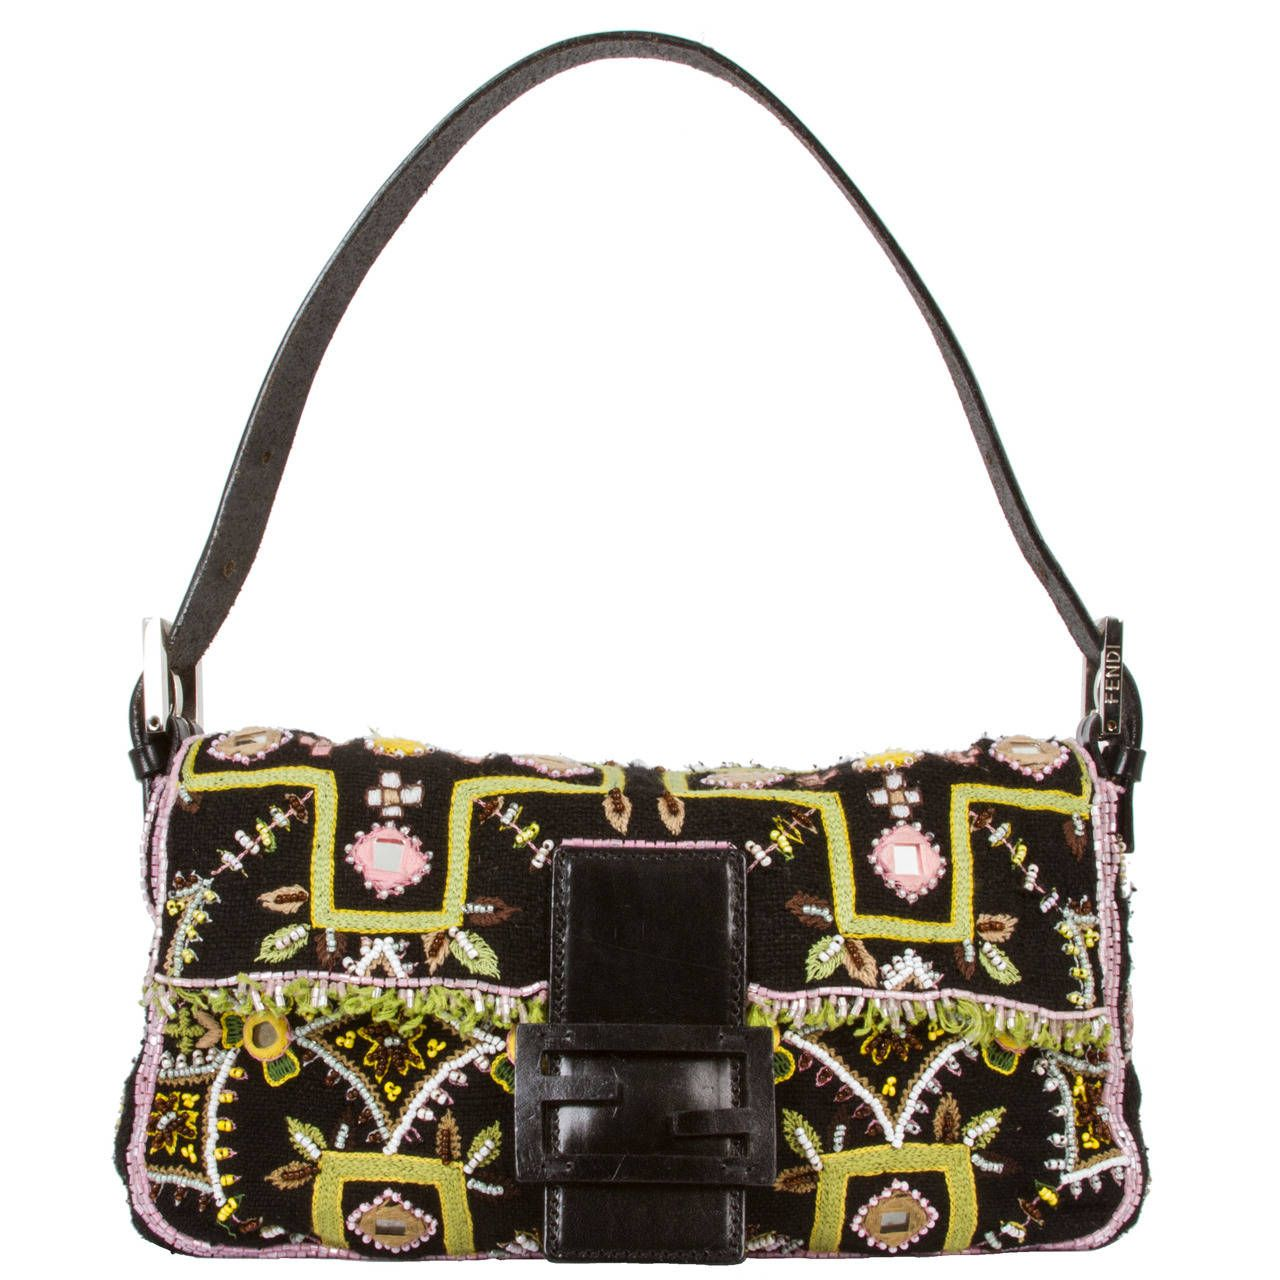 Fendi Beaded Mirrored And Embroidered Handbag